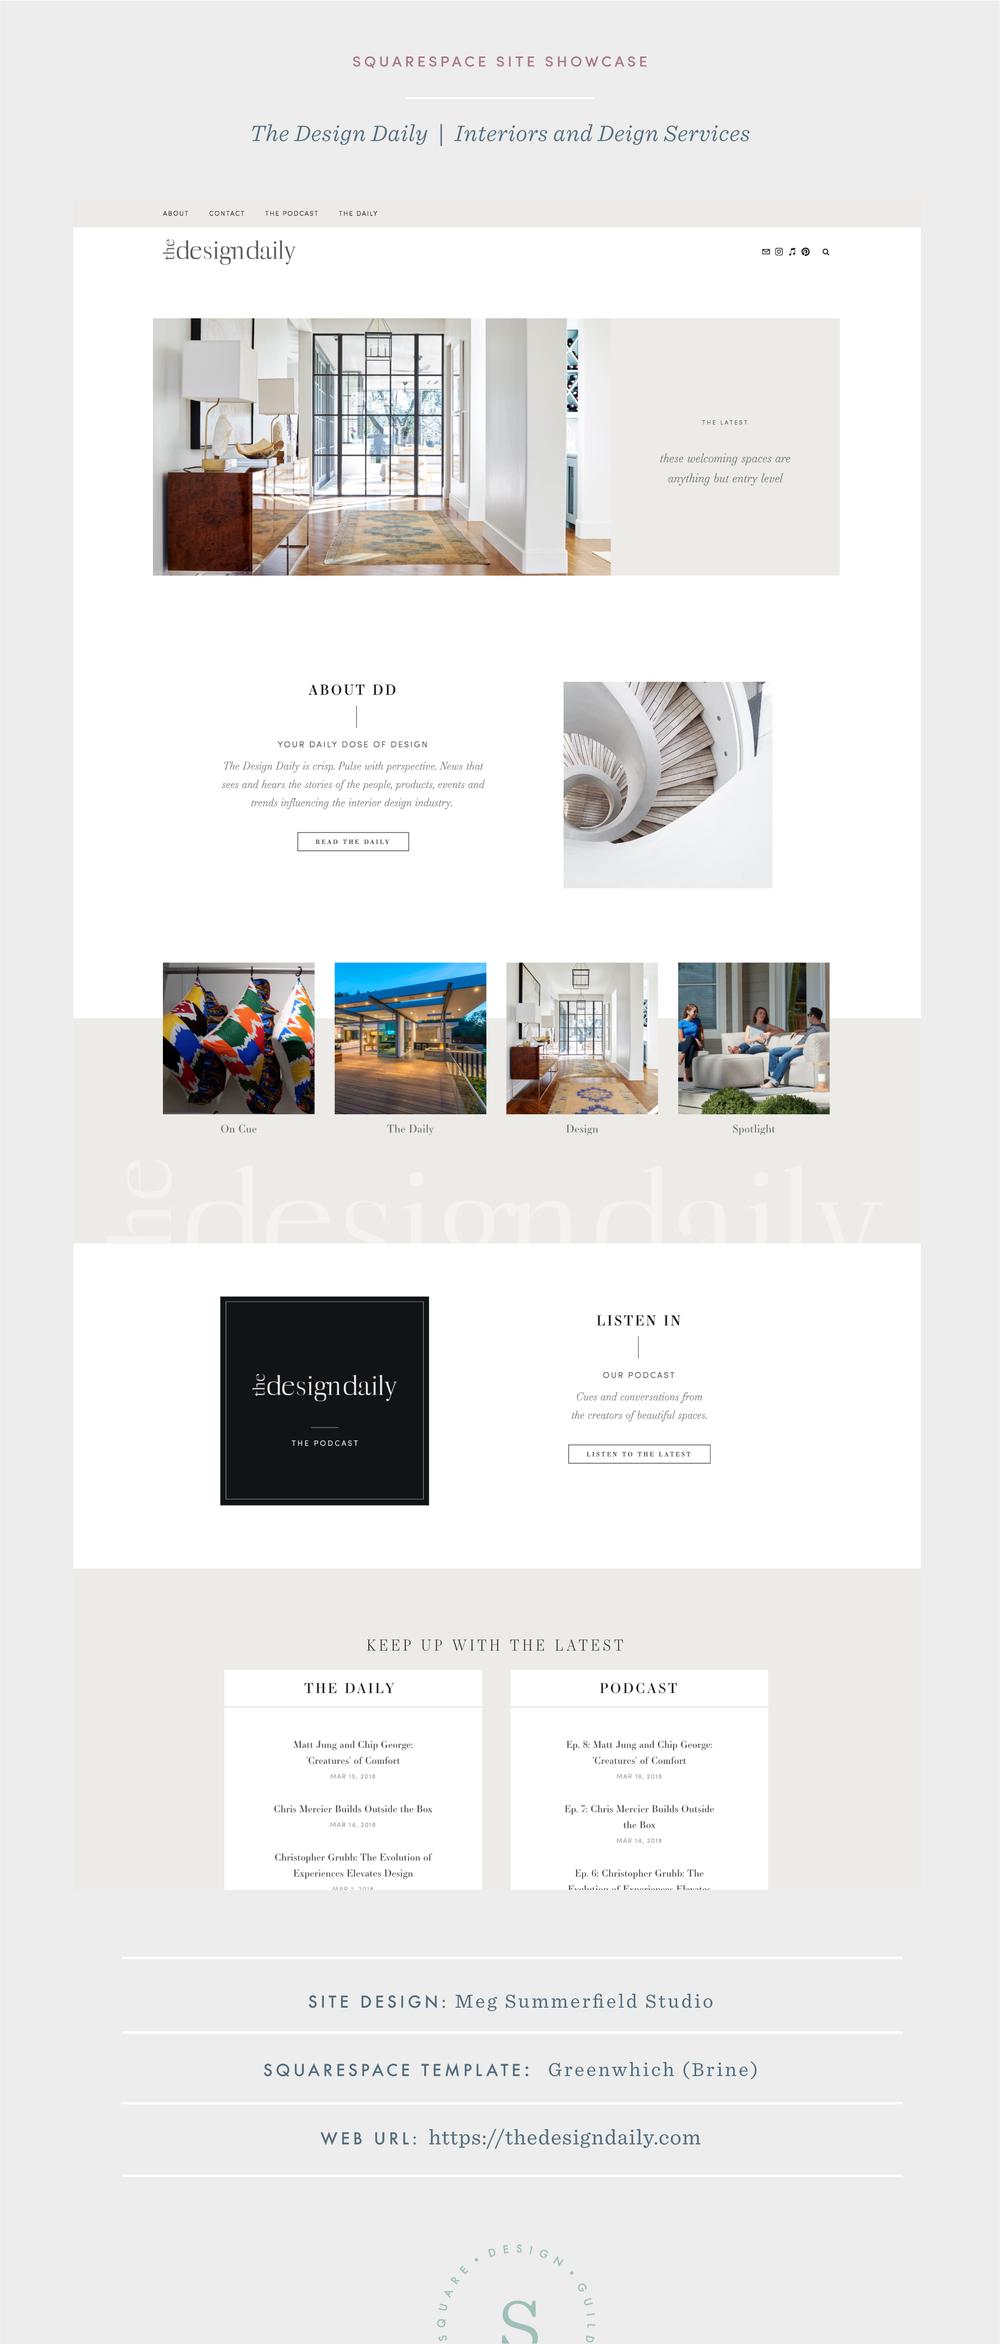 Site design for interior design blog on Squarespace